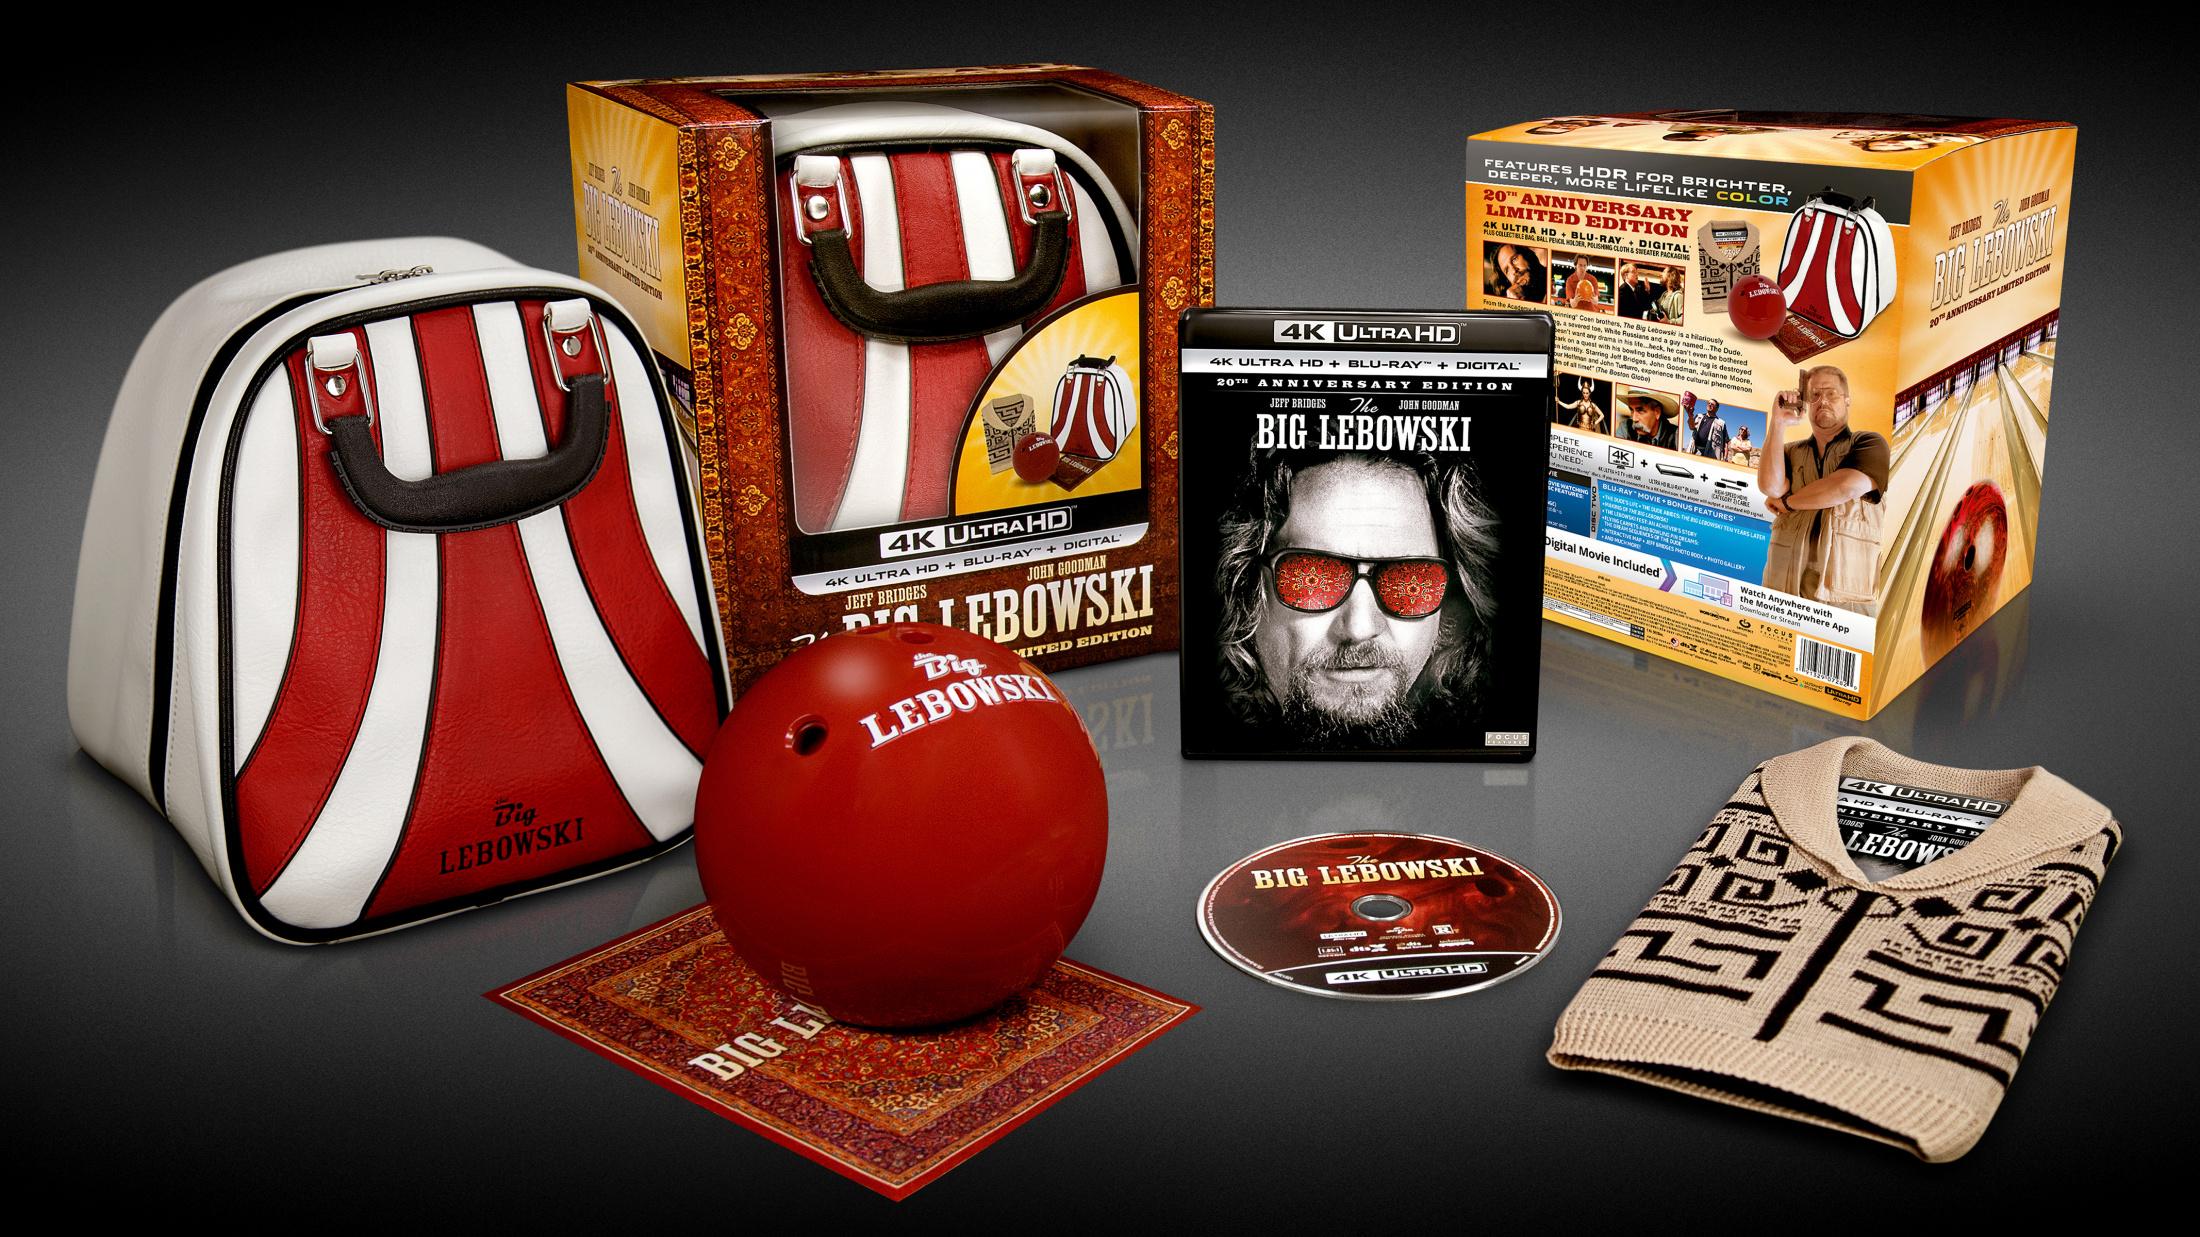 Thumbnail for The Big Lebowski - 20th Anniversary